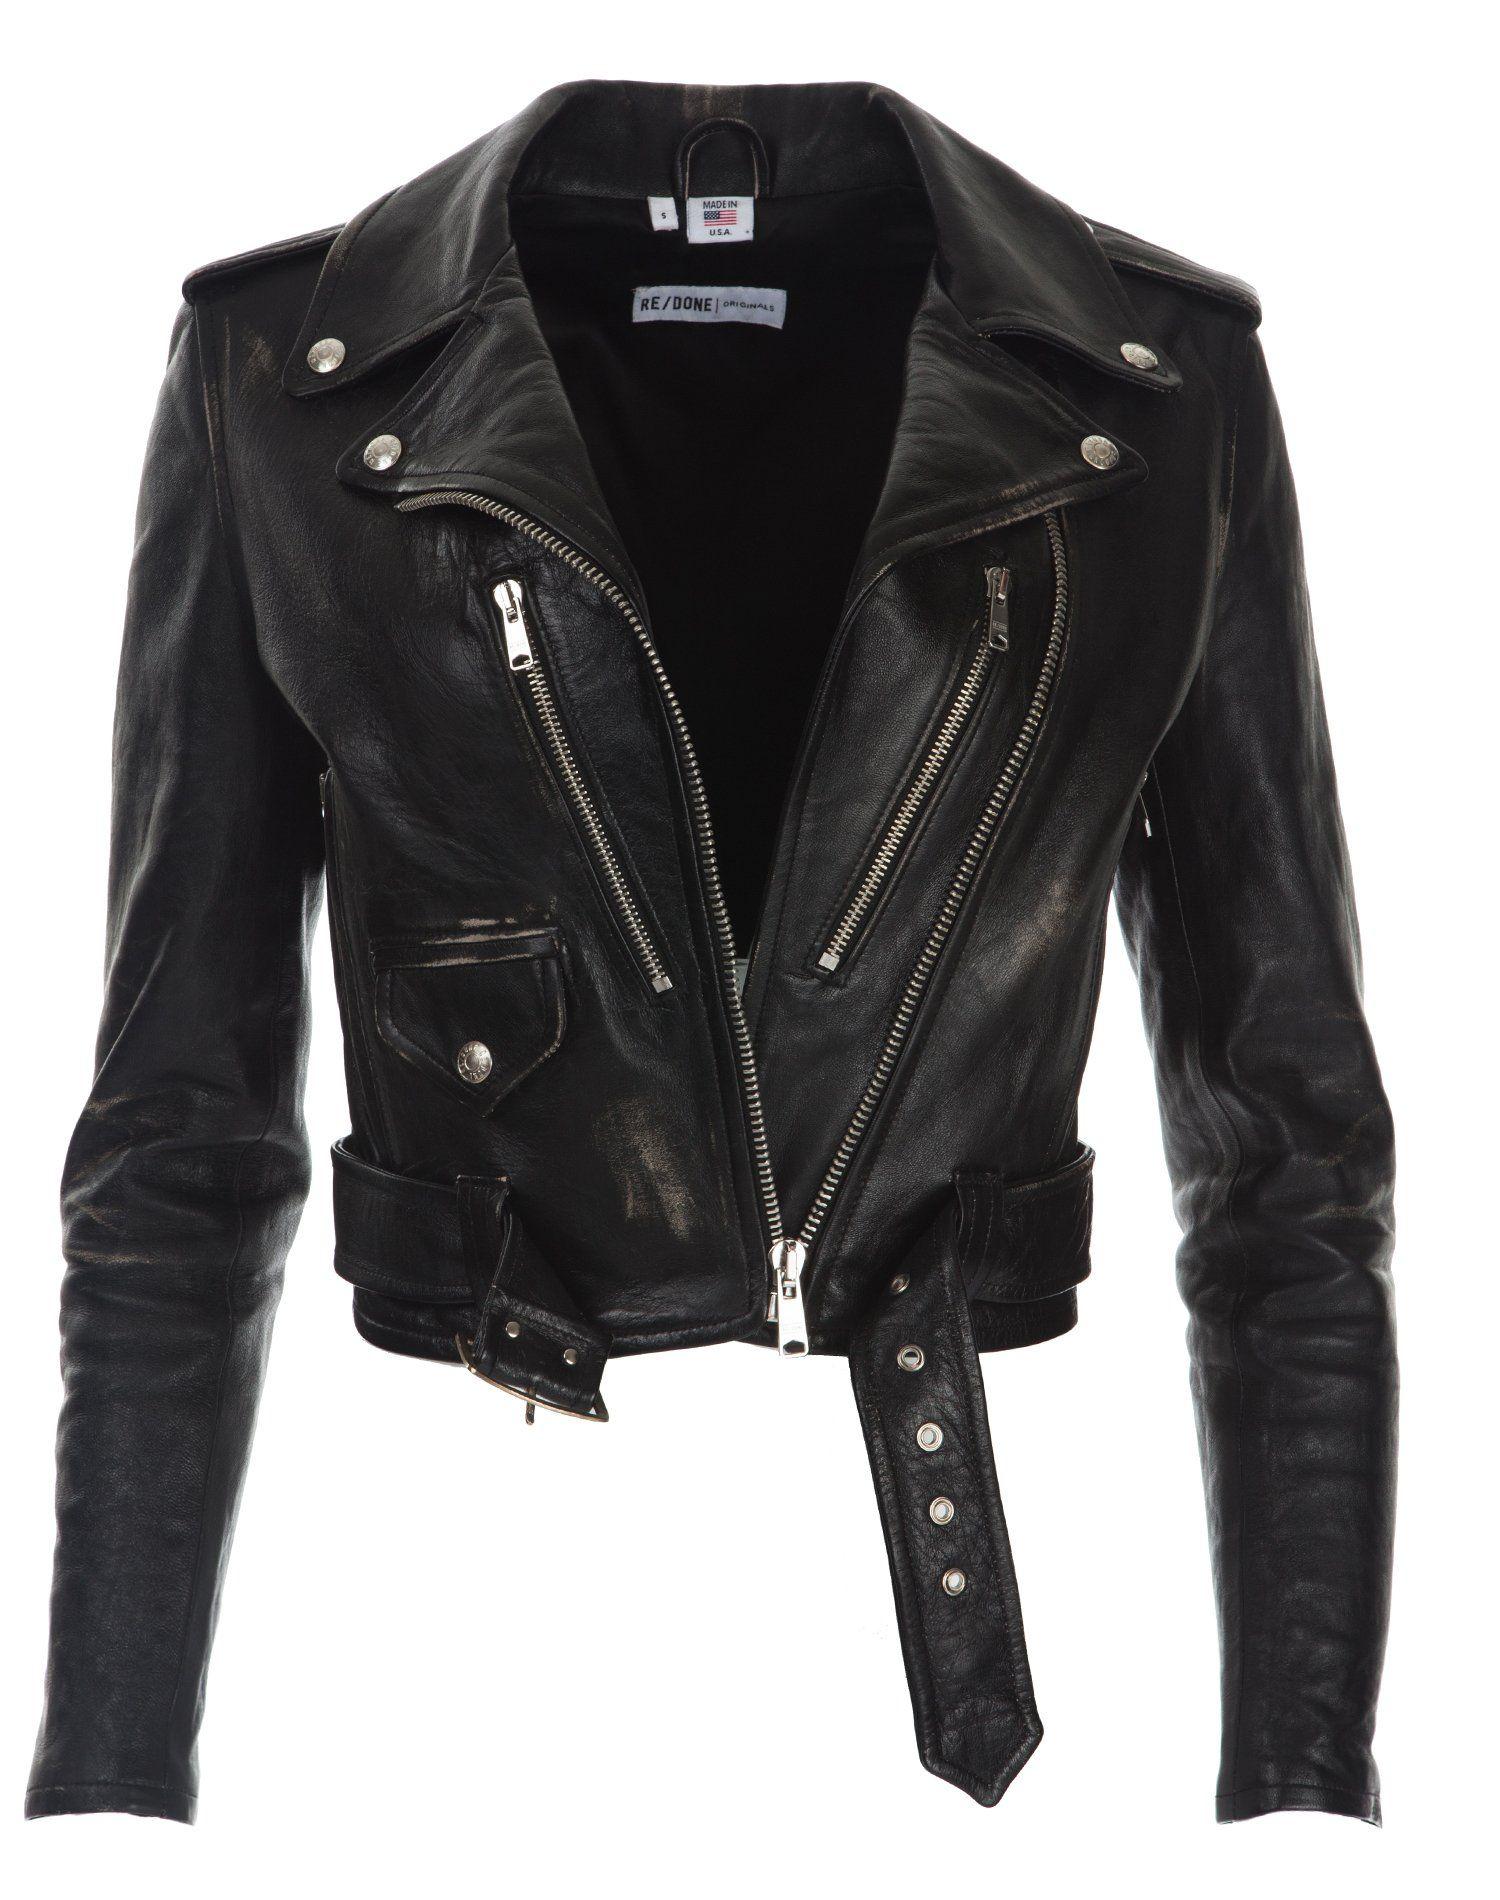 Re Done Leather Moto Jacket Vintage Black Size Medium In 2021 Leather Moto Jacket Vintage Leather Jacket Leather Jacket [ 1900 x 1500 Pixel ]